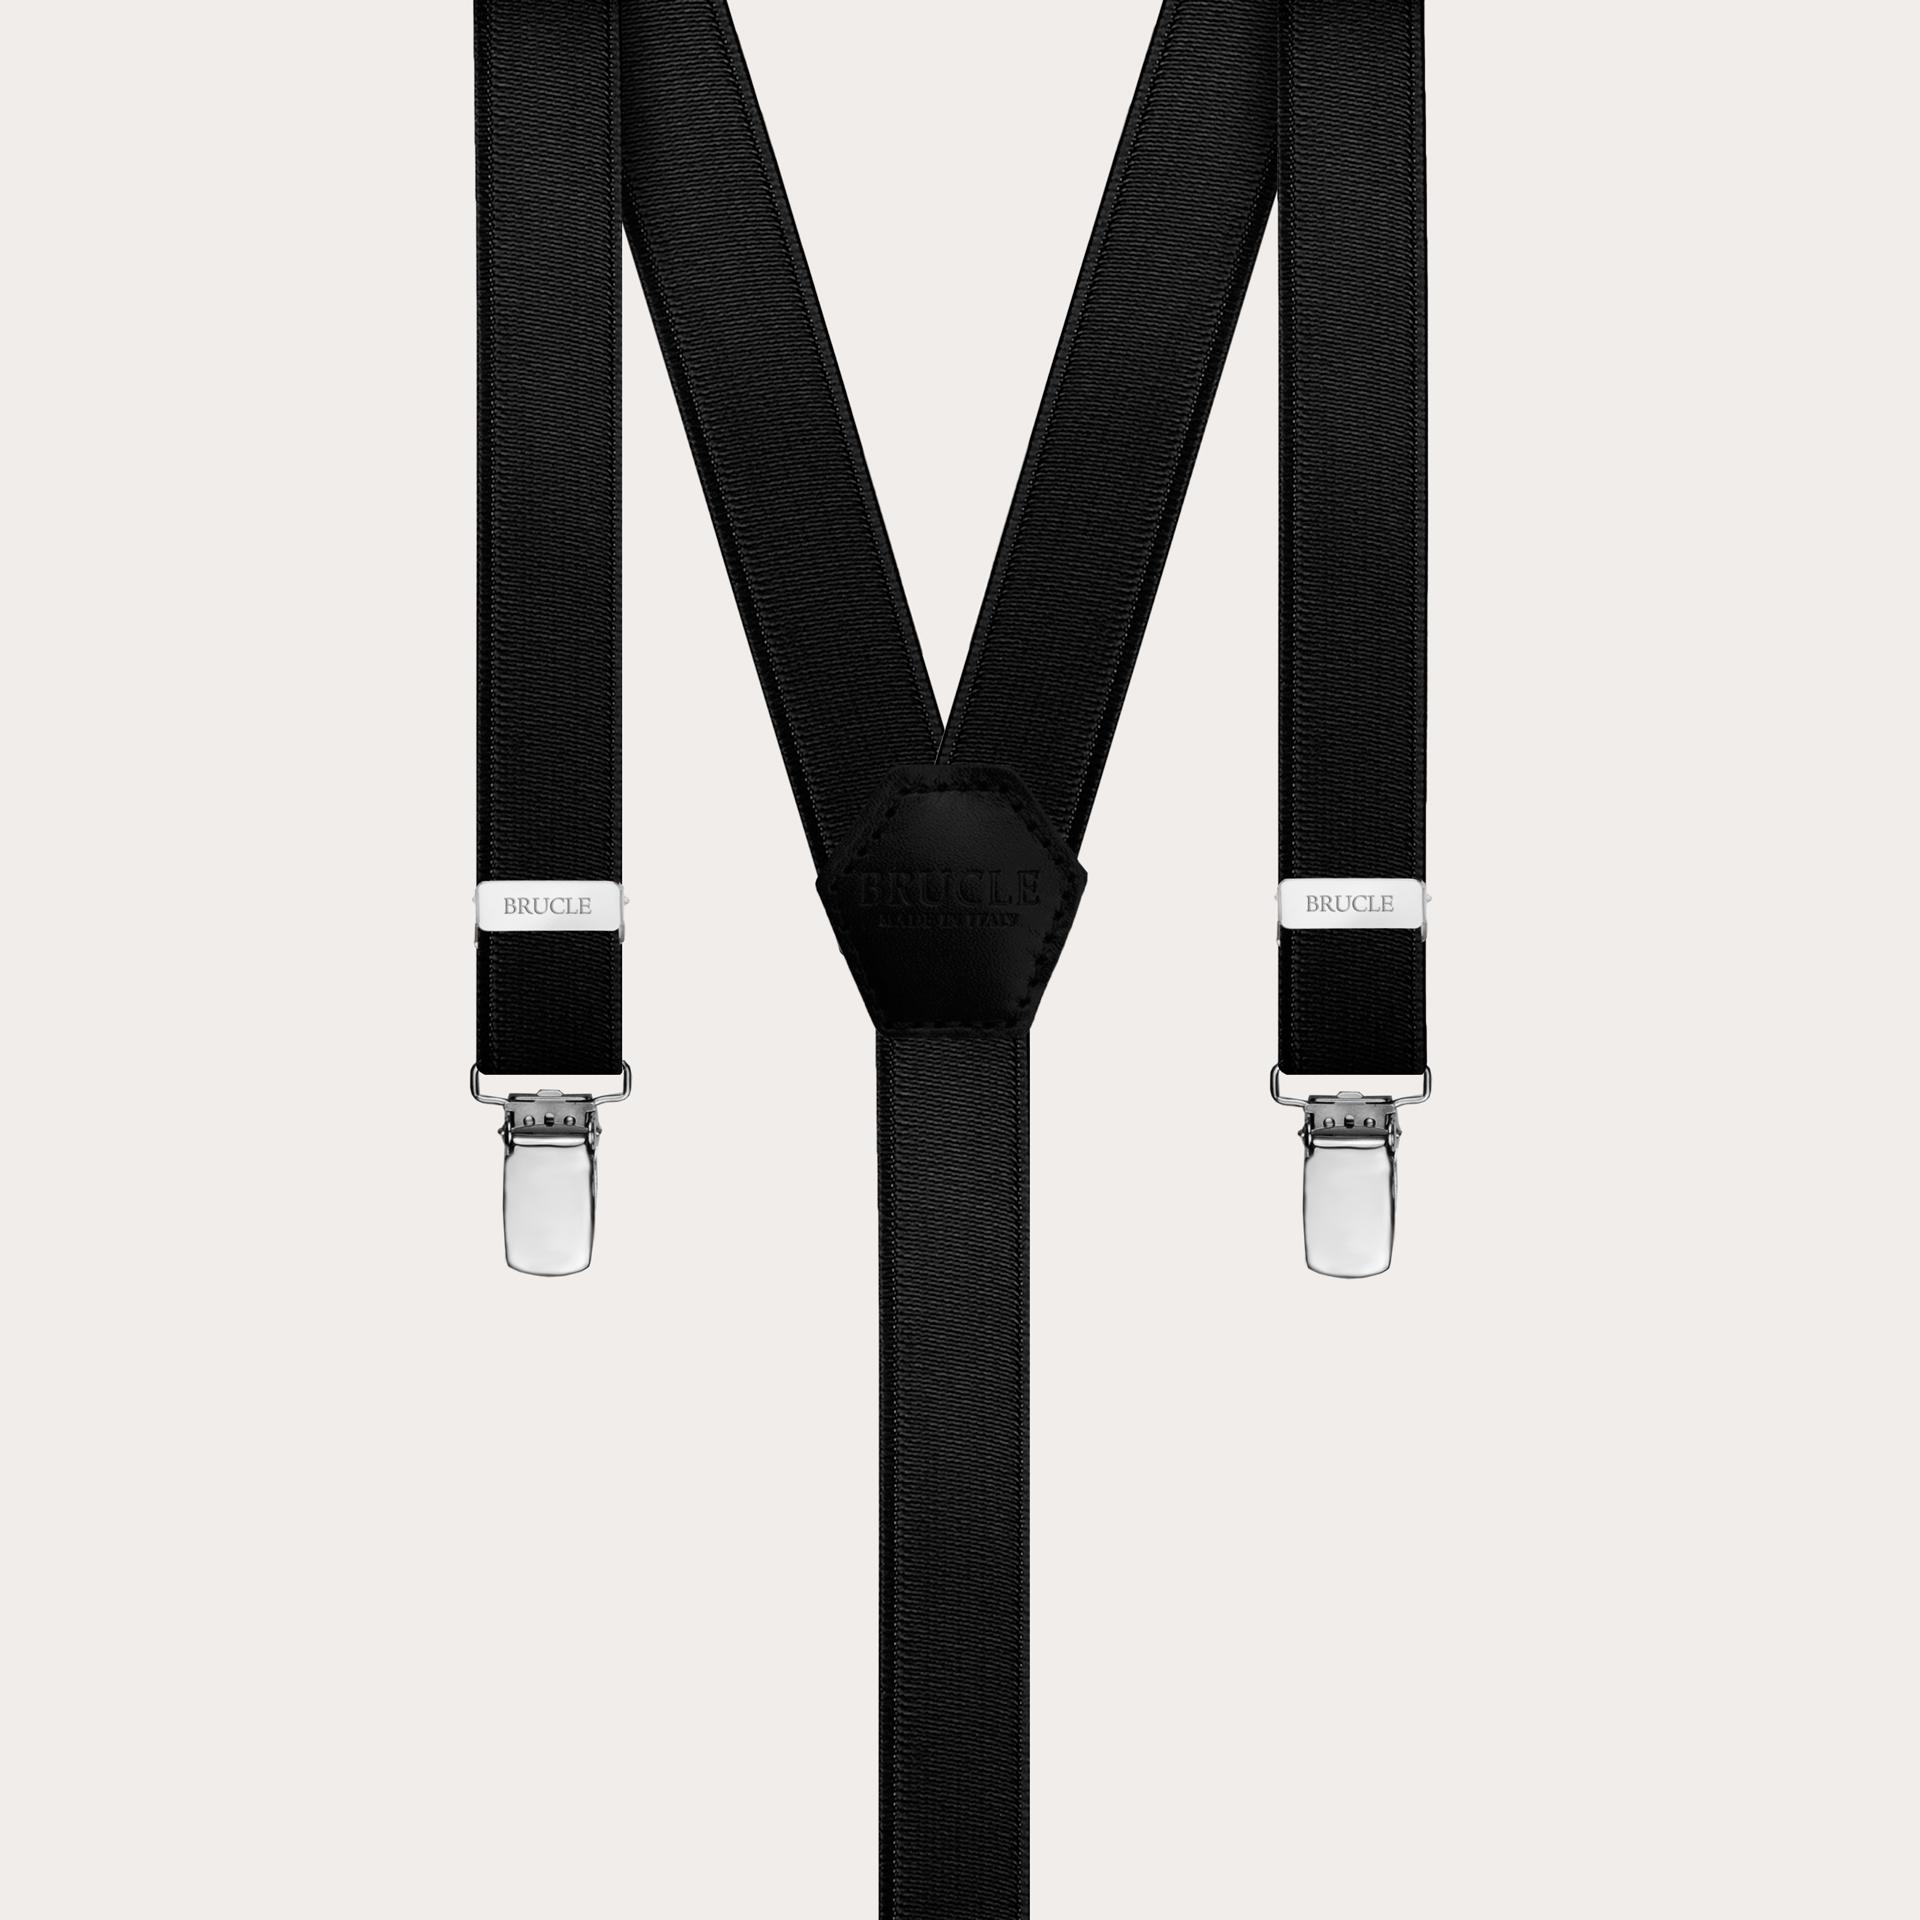 Formal skinny Y-shape elastic suspenders with clips, satin black